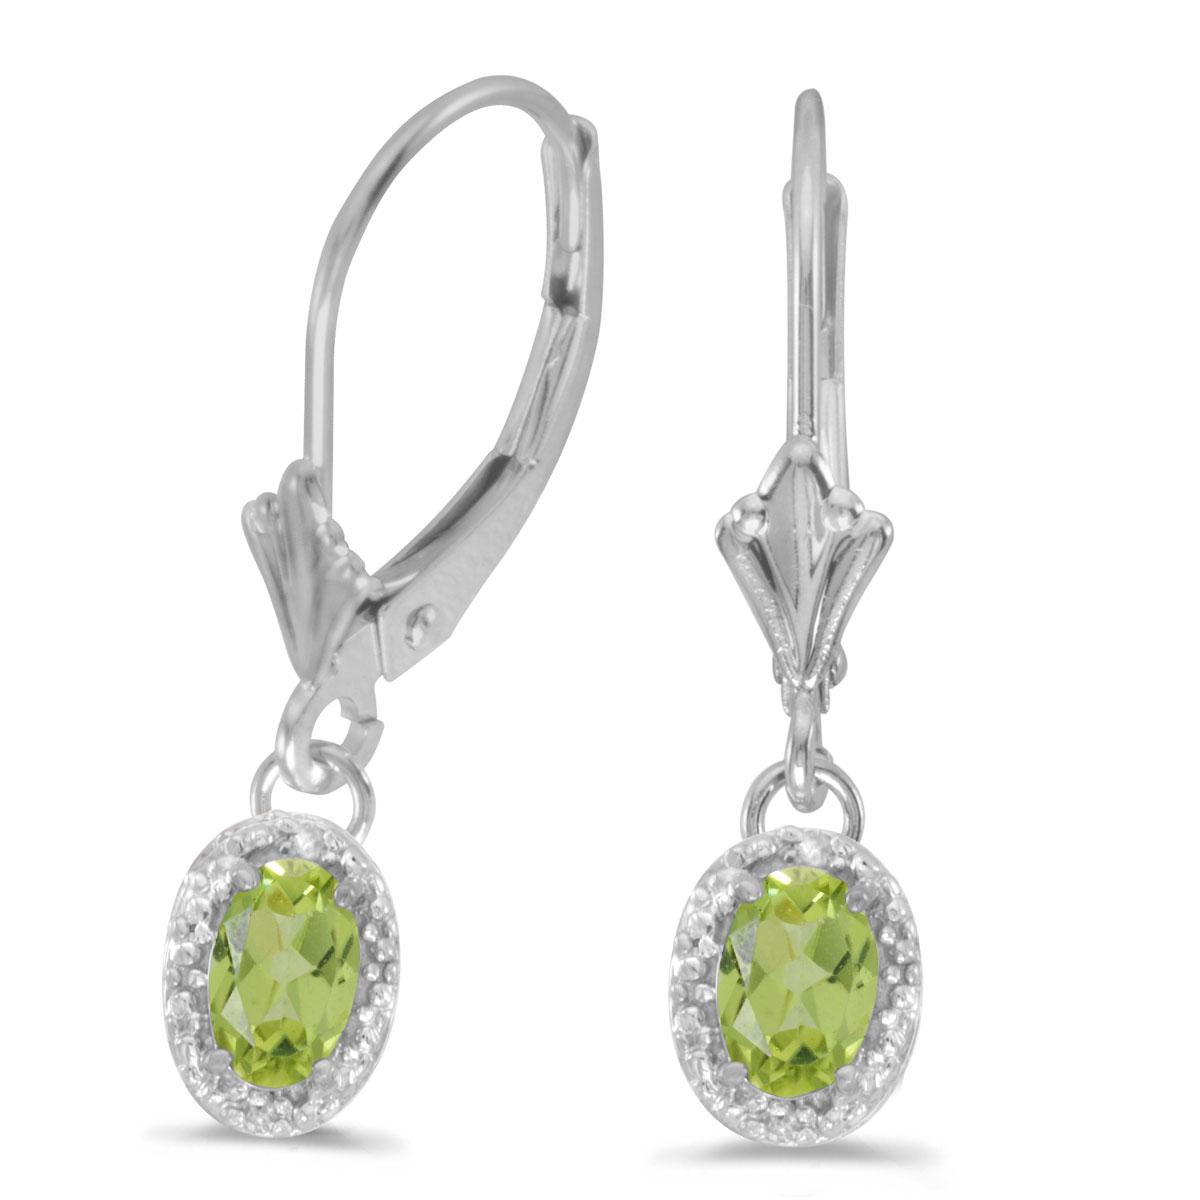 14k White Gold Oval Peridot And Diamond Leverback Earrings